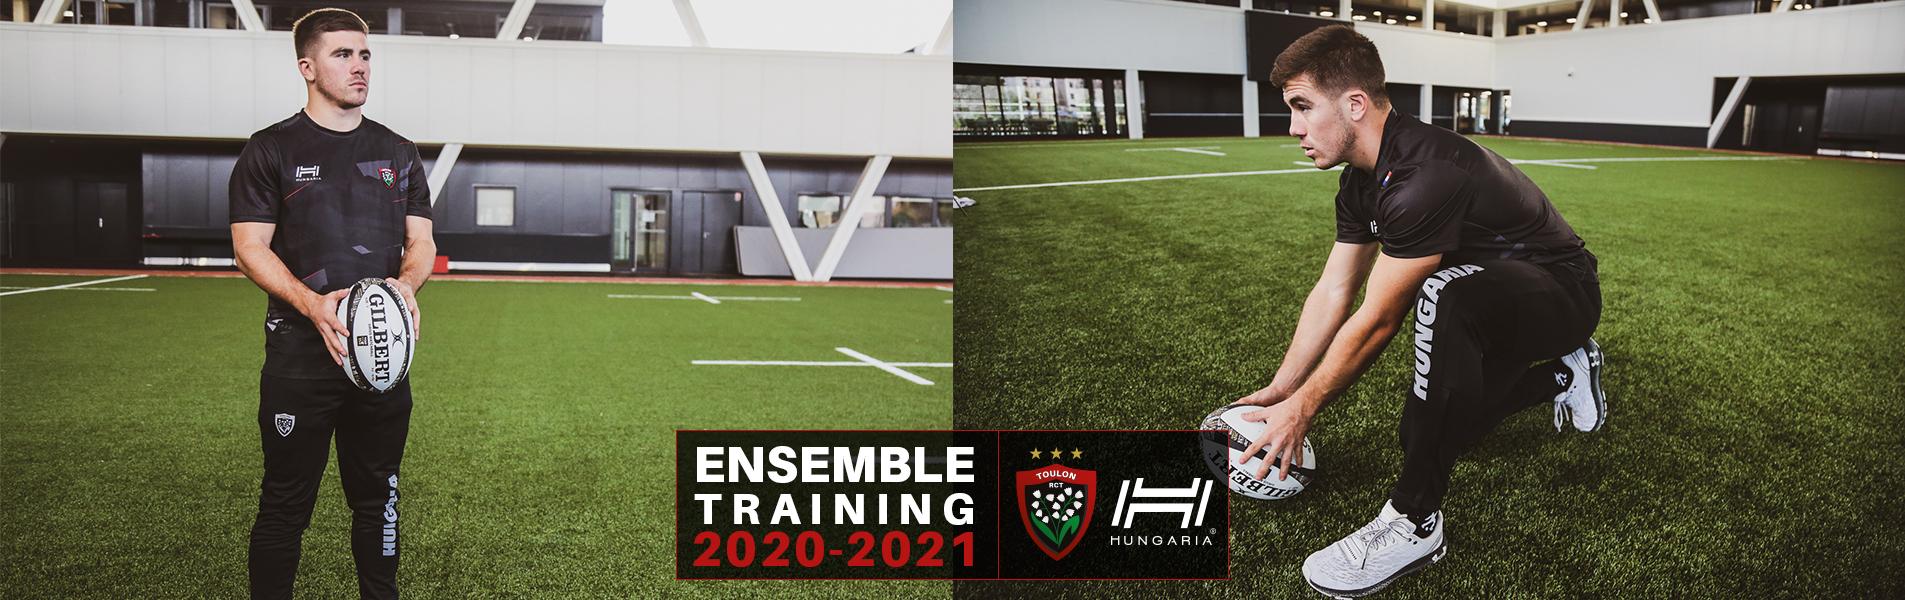 ensemble_training_1905x600